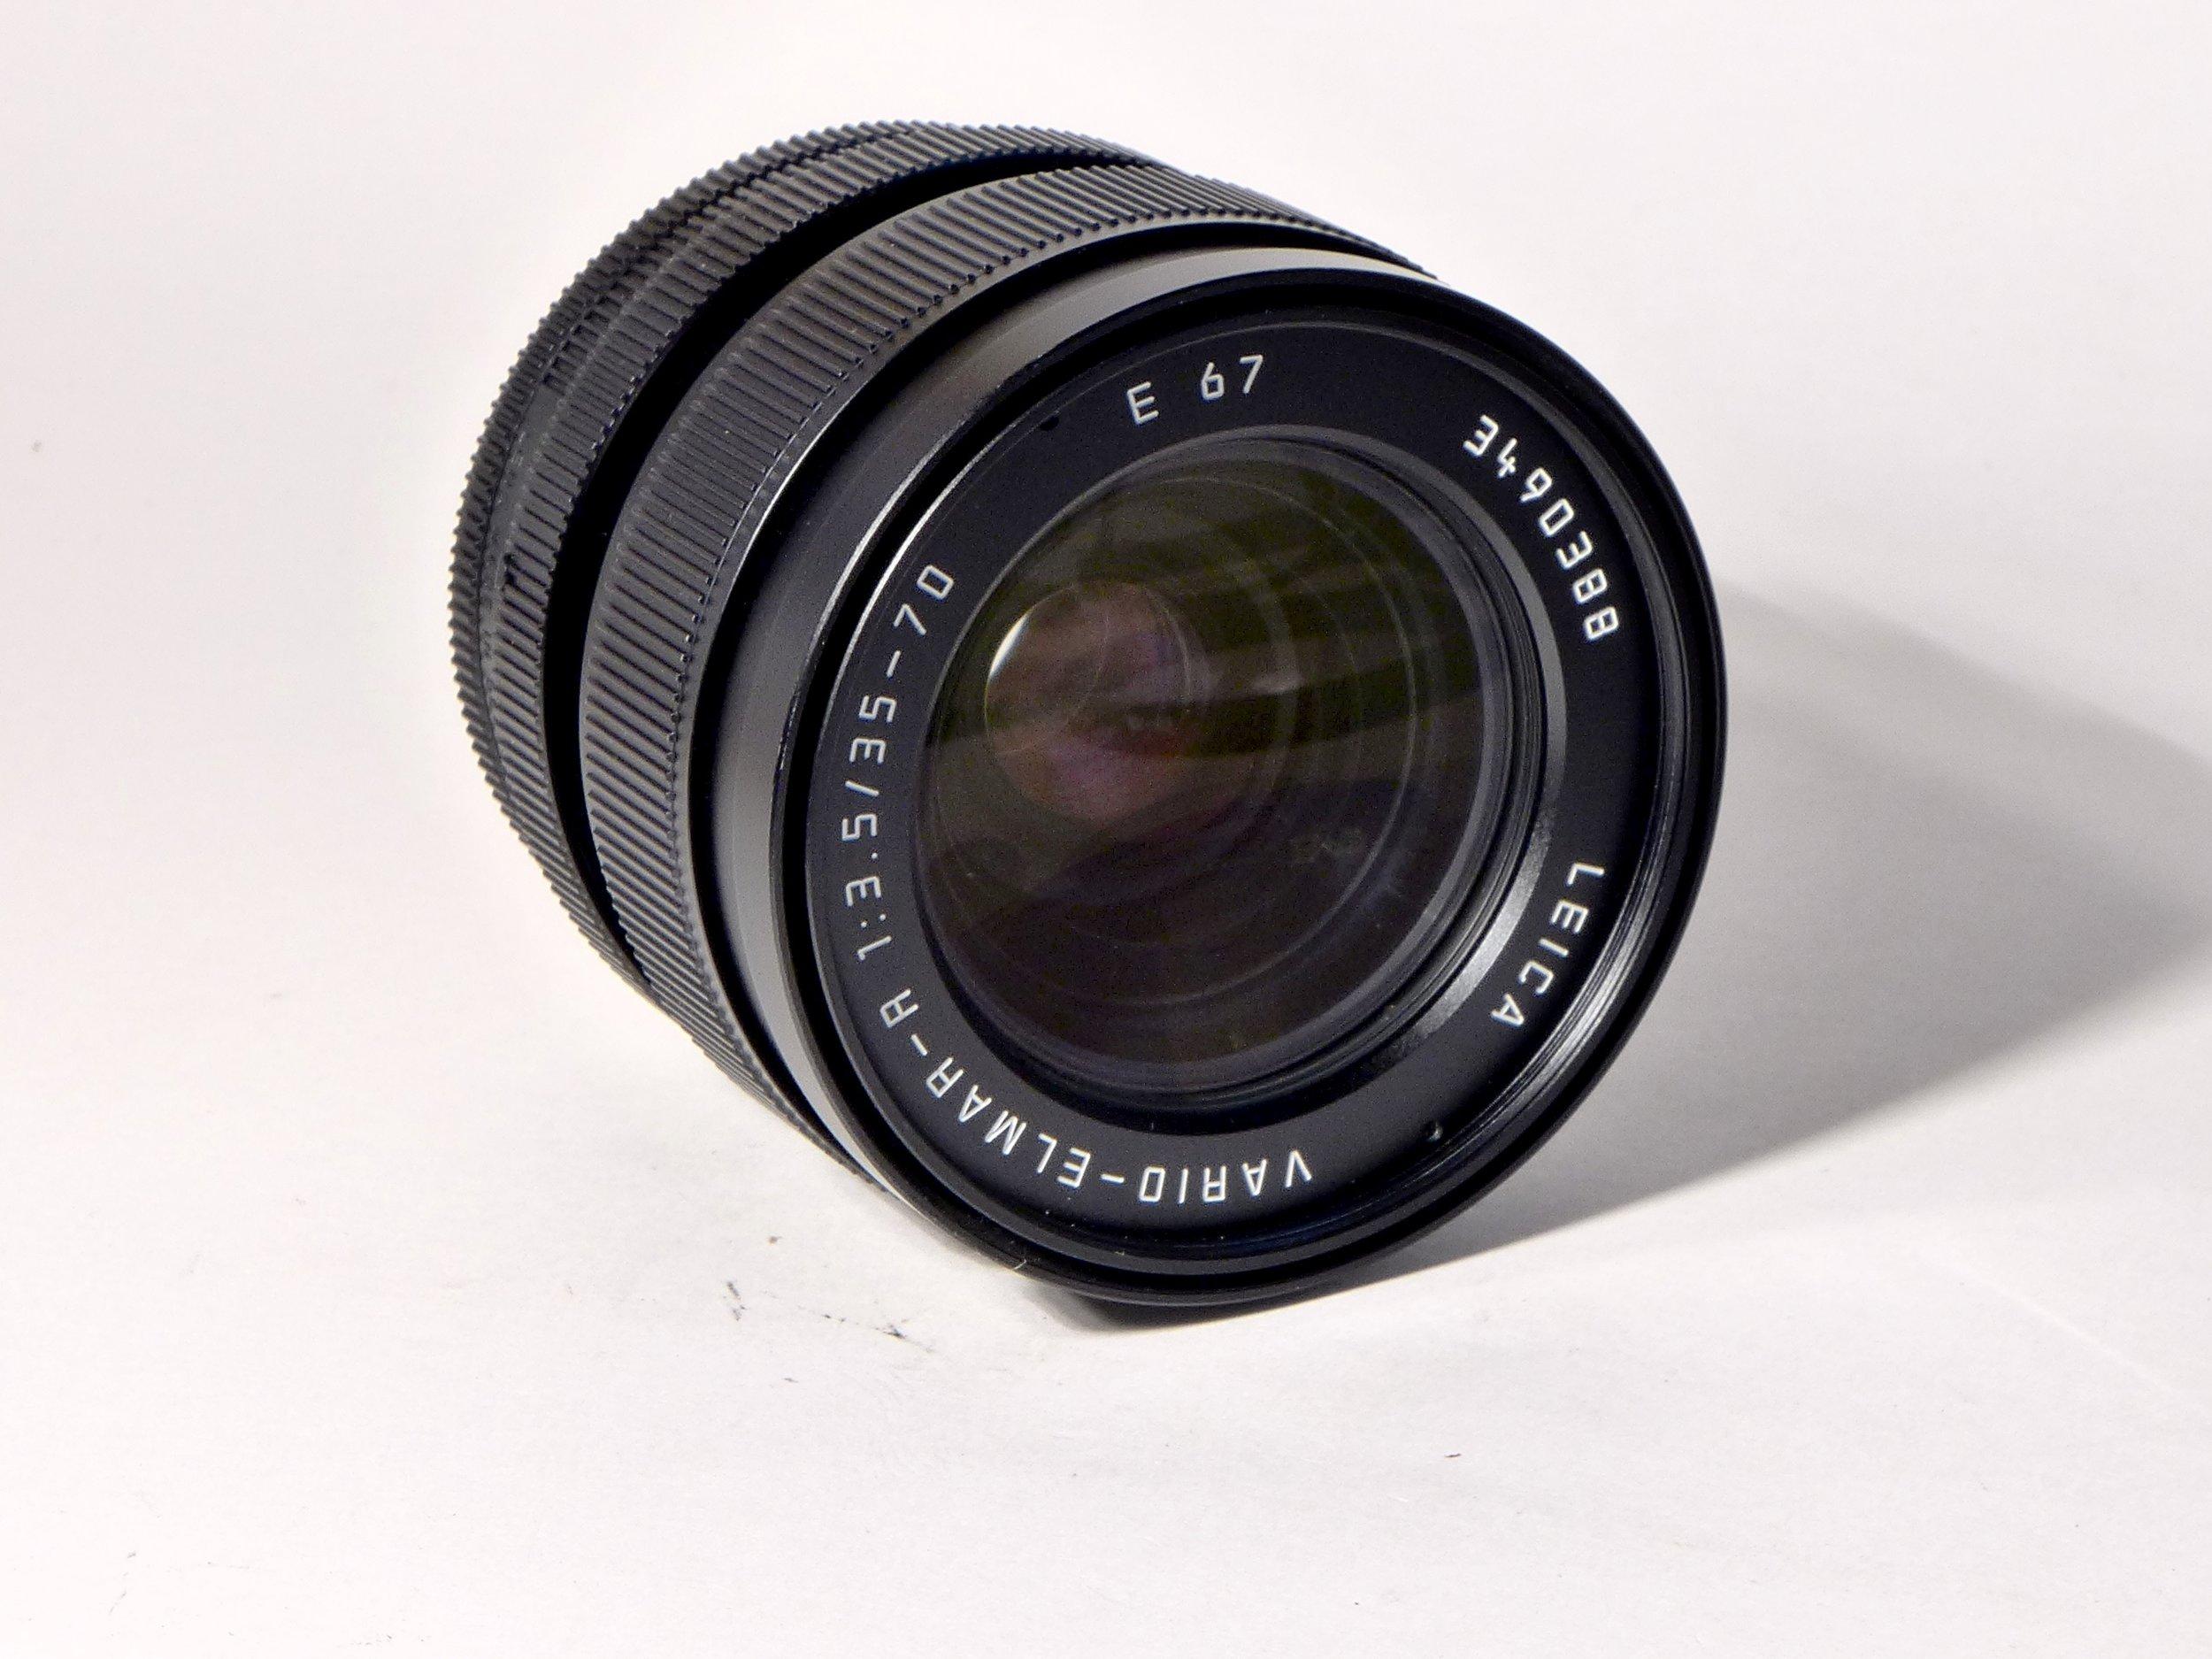 Leica R Vario-Elmar 35mm-70mm f/3.5 (Ken Hansen Photo)